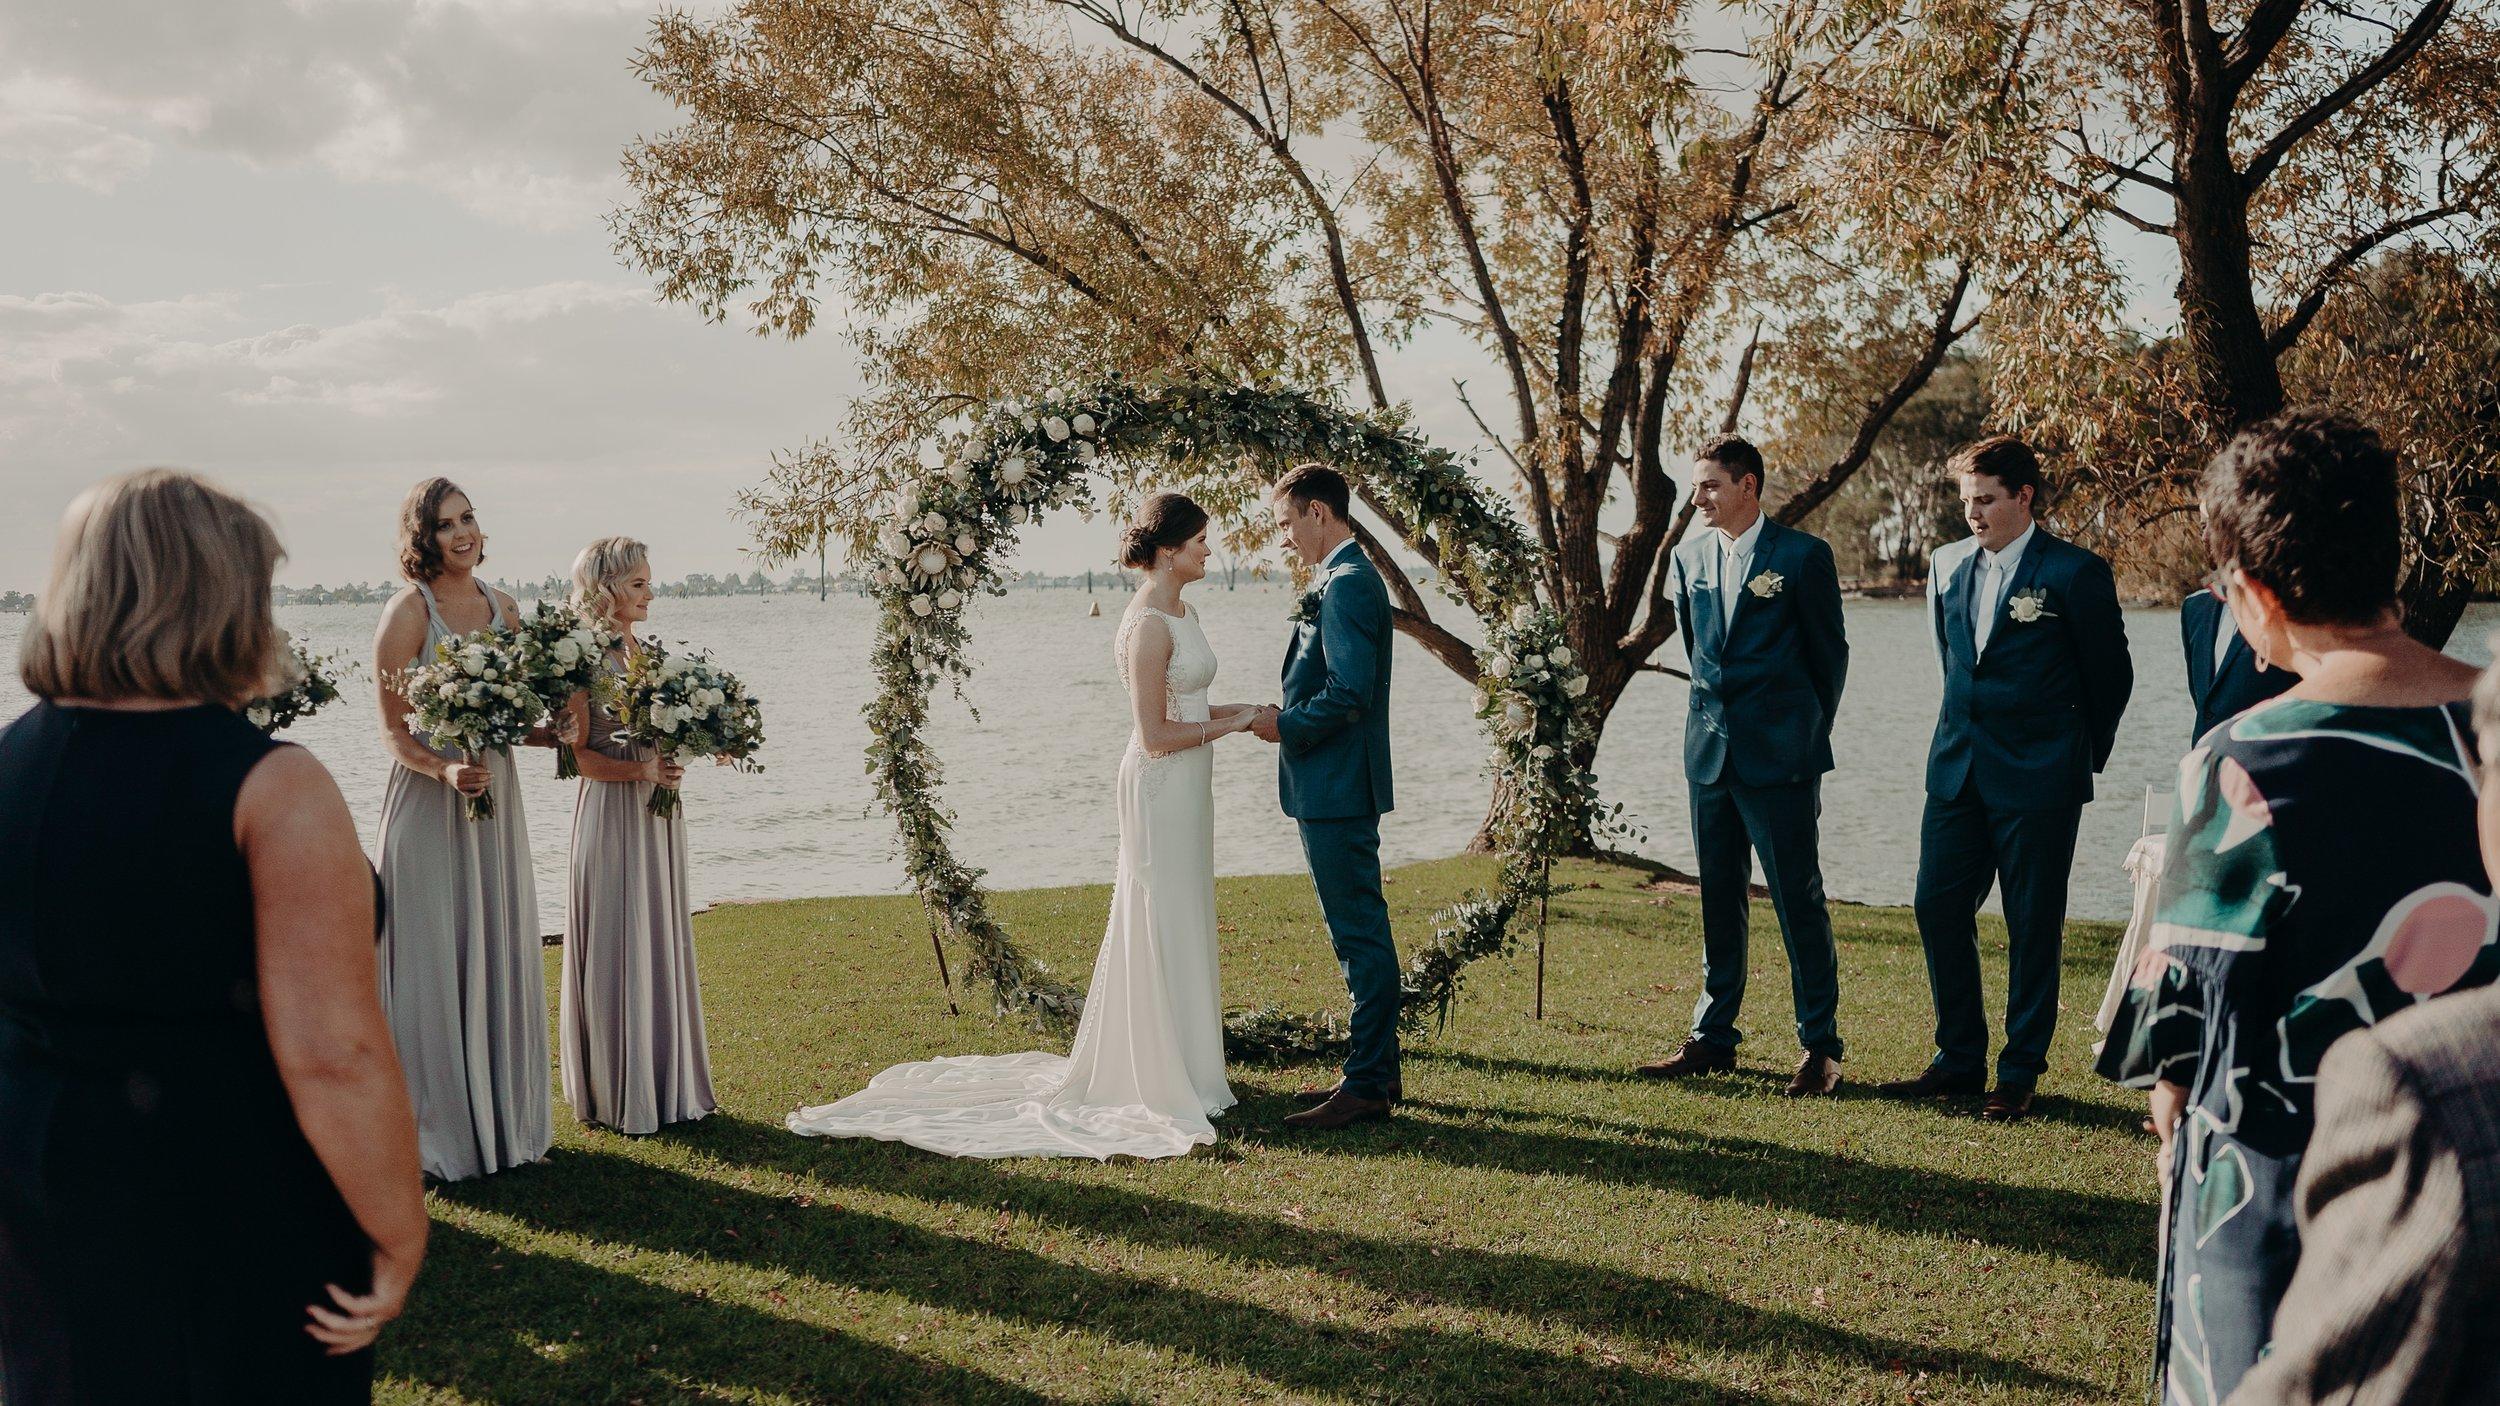 mickalathomas_puremacphotography_weddingphotographer_couplephotographer_Sheppartonphotographer_2536.jpg